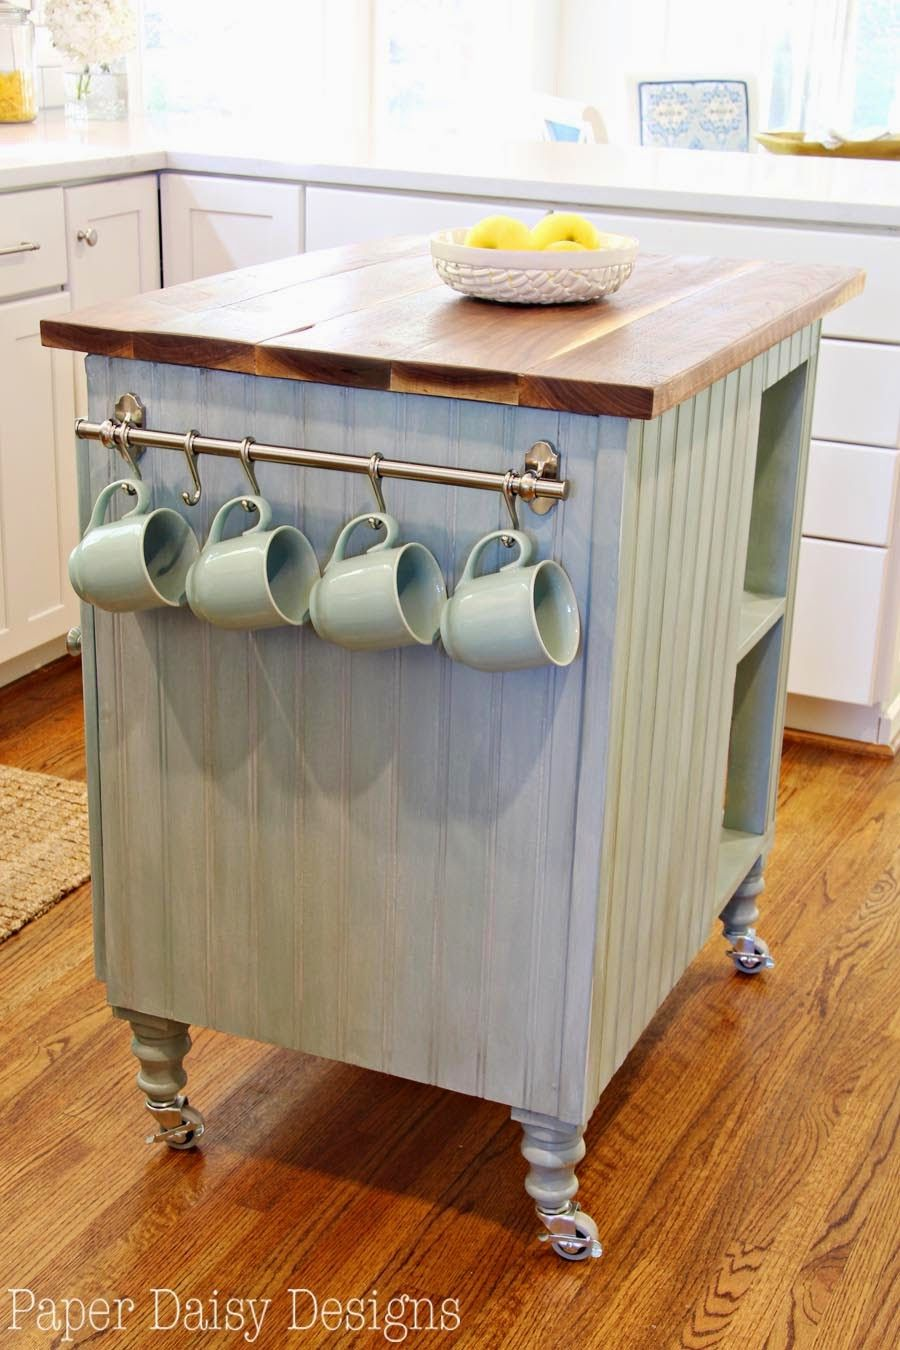 Paper Daisy Designs: DIY Kitchen Island Cart